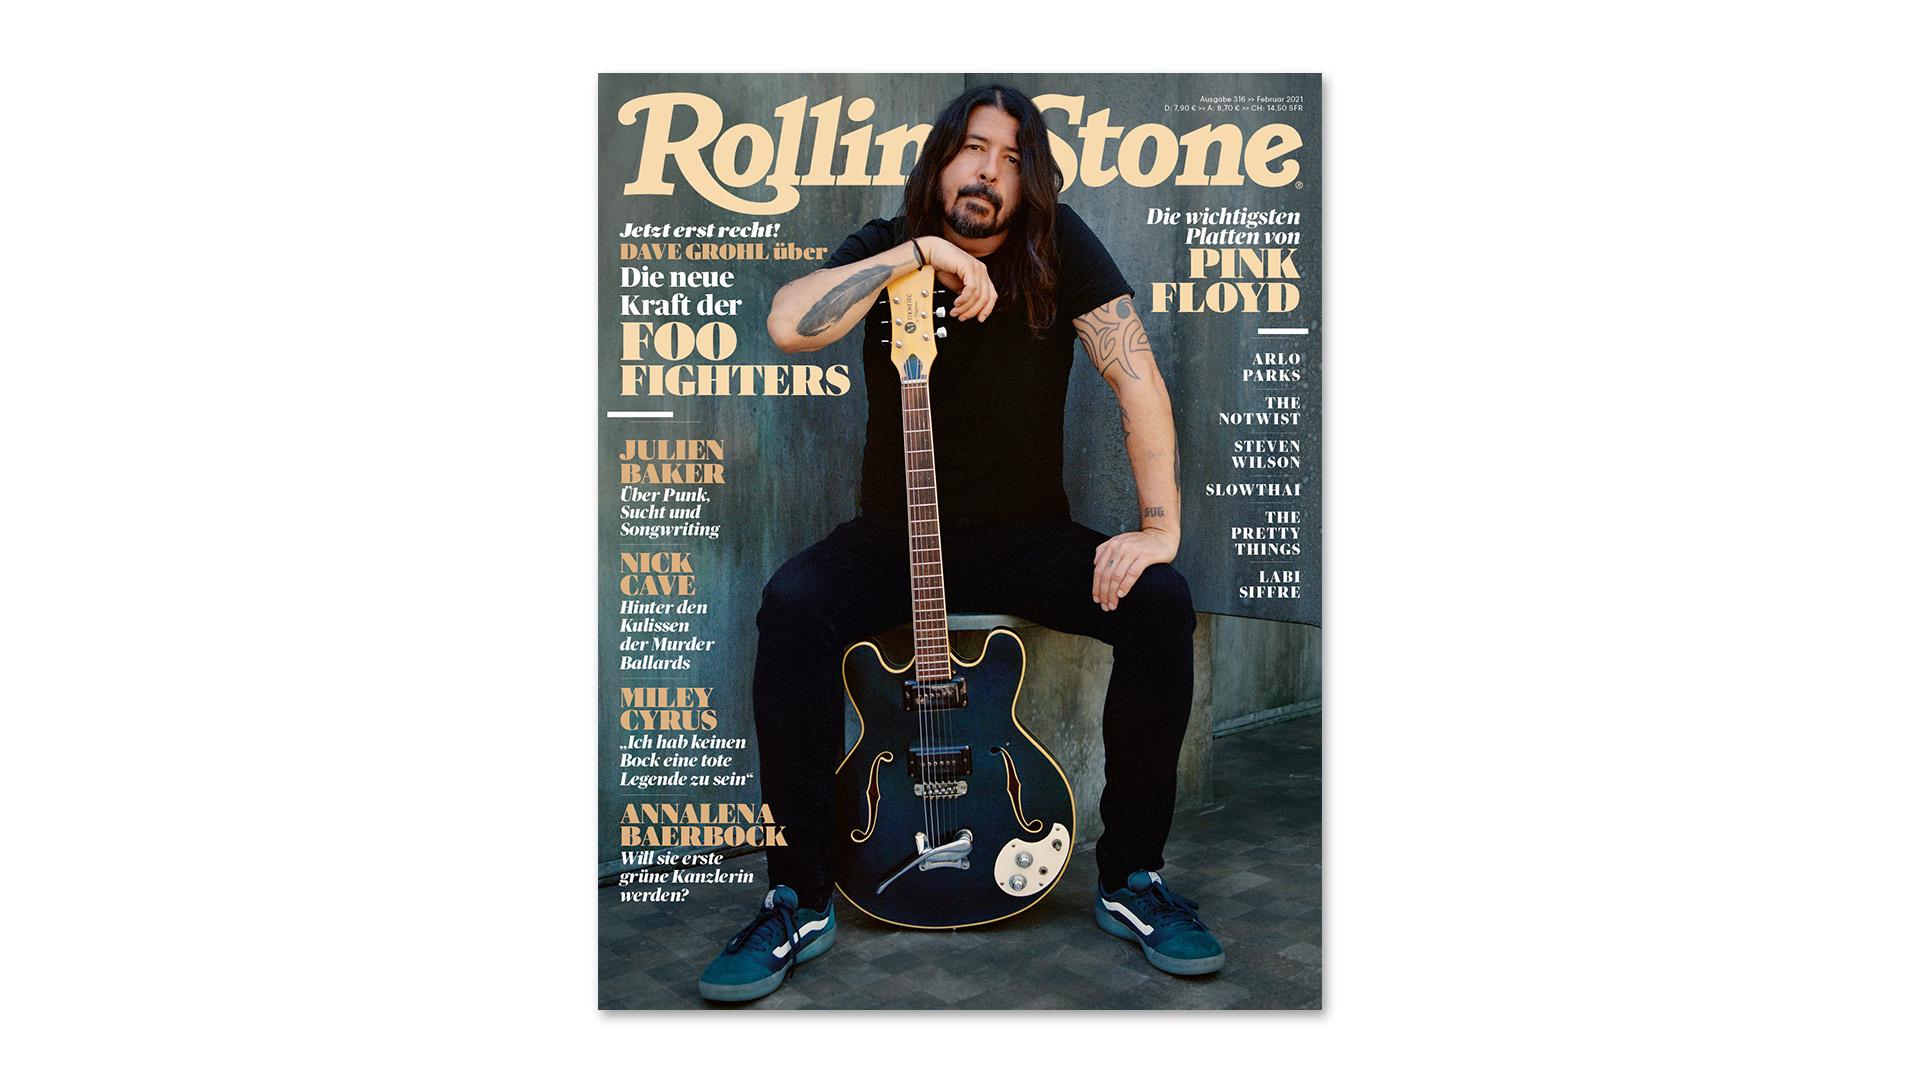 ROLLING STONE im Februar 2021 – Titelthema: Foo Fighters